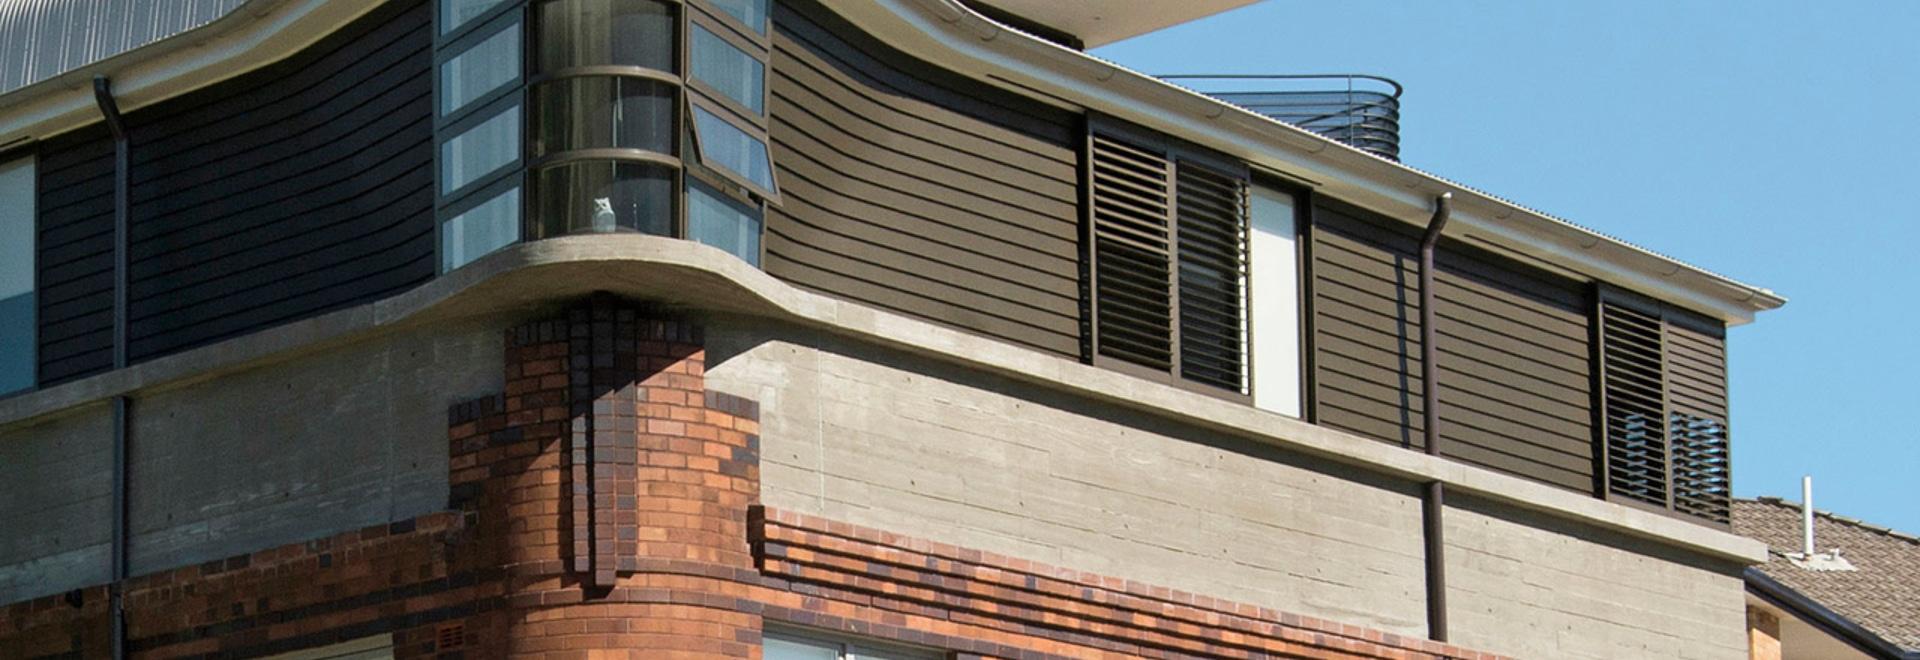 Luigi Rosselli Architects, The Bow Window Penthouse, Bondi Beach, Sydney, Australia